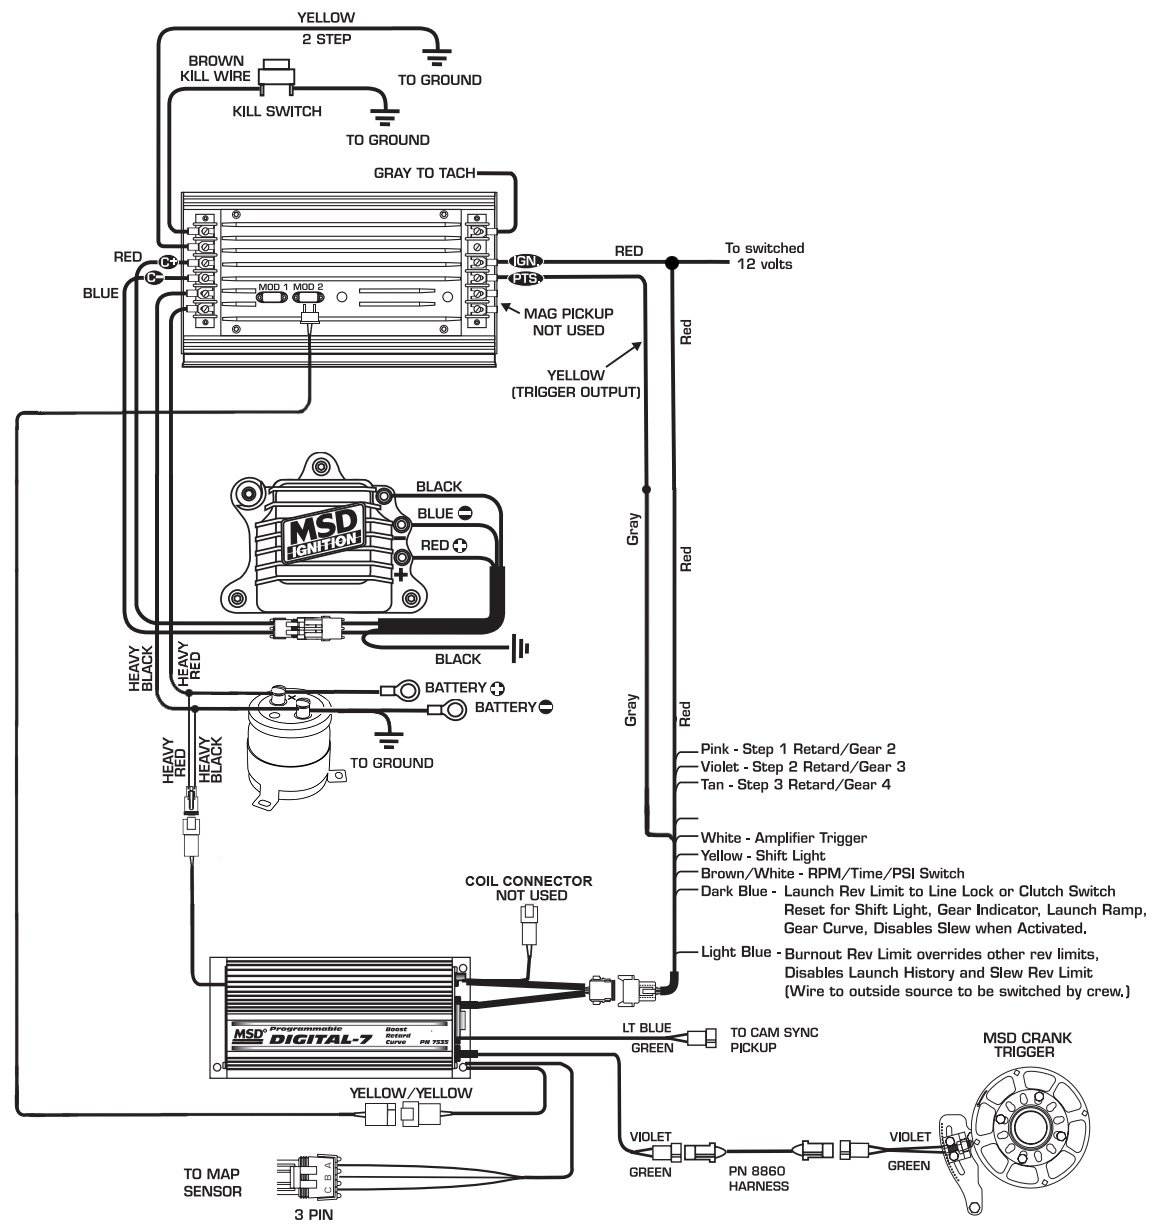 msd blaster coil wiring diagram electric cooker installation 8950 tab organisedmum de a8e lektionenderliebe u2022 rh